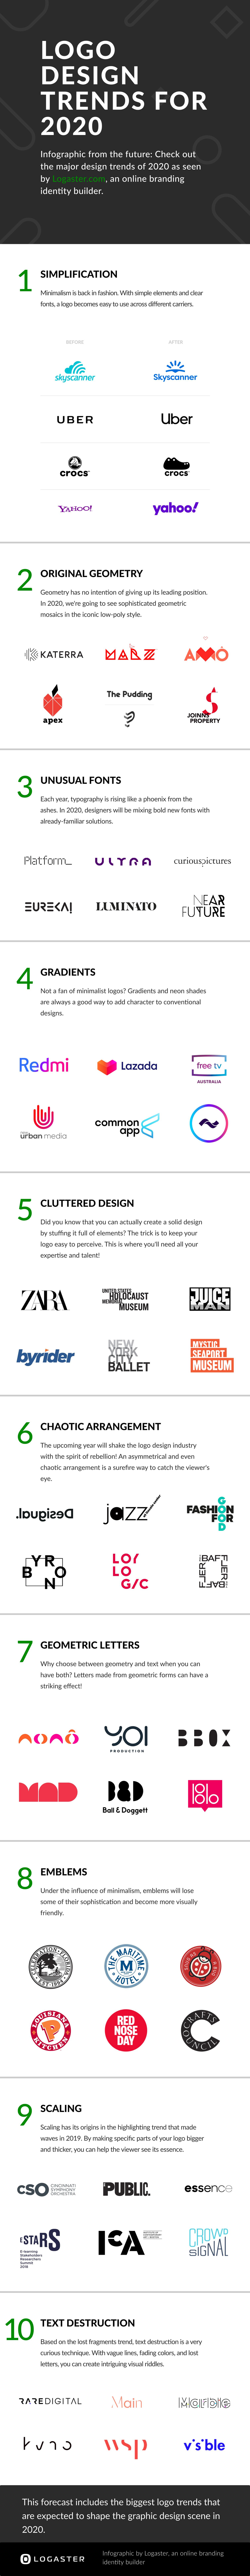 Logo Design Trends 2020.Top 10 Logo Design Trends For 2020